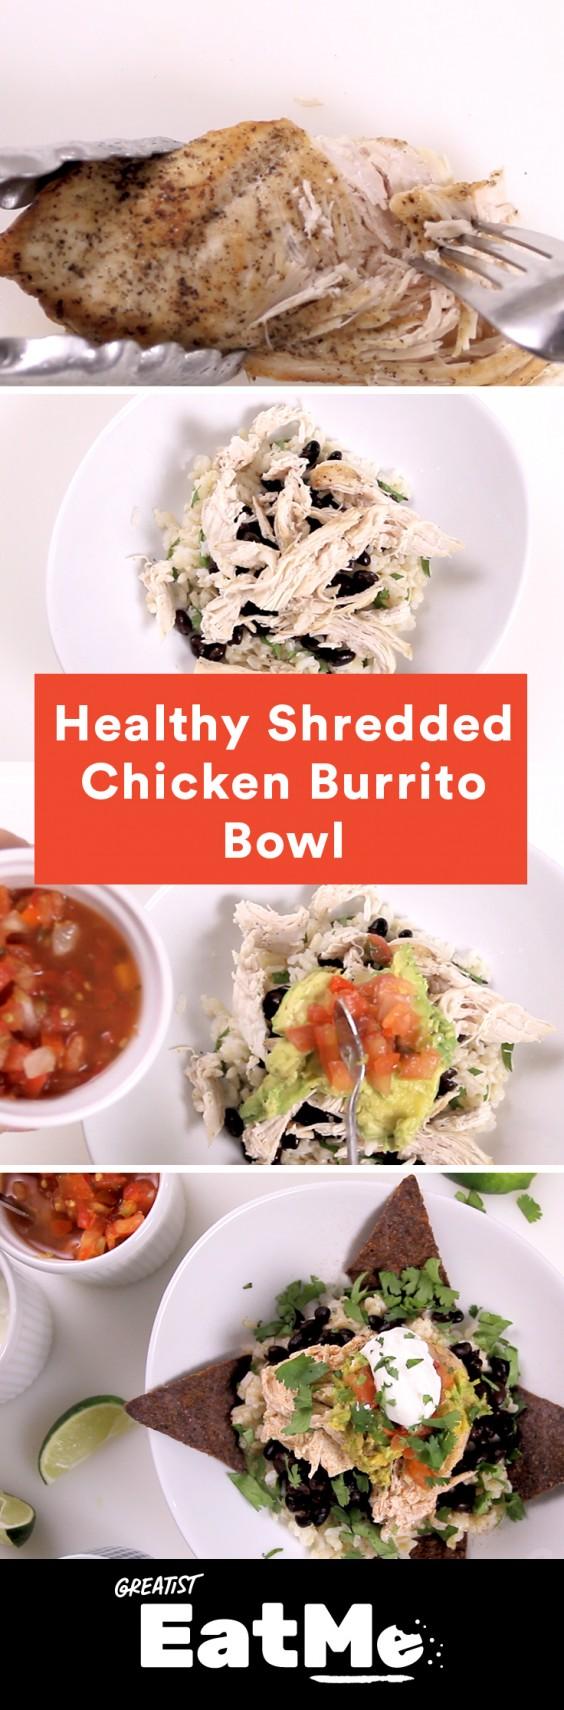 Eat Me Video: Chicken Burrito Bowl